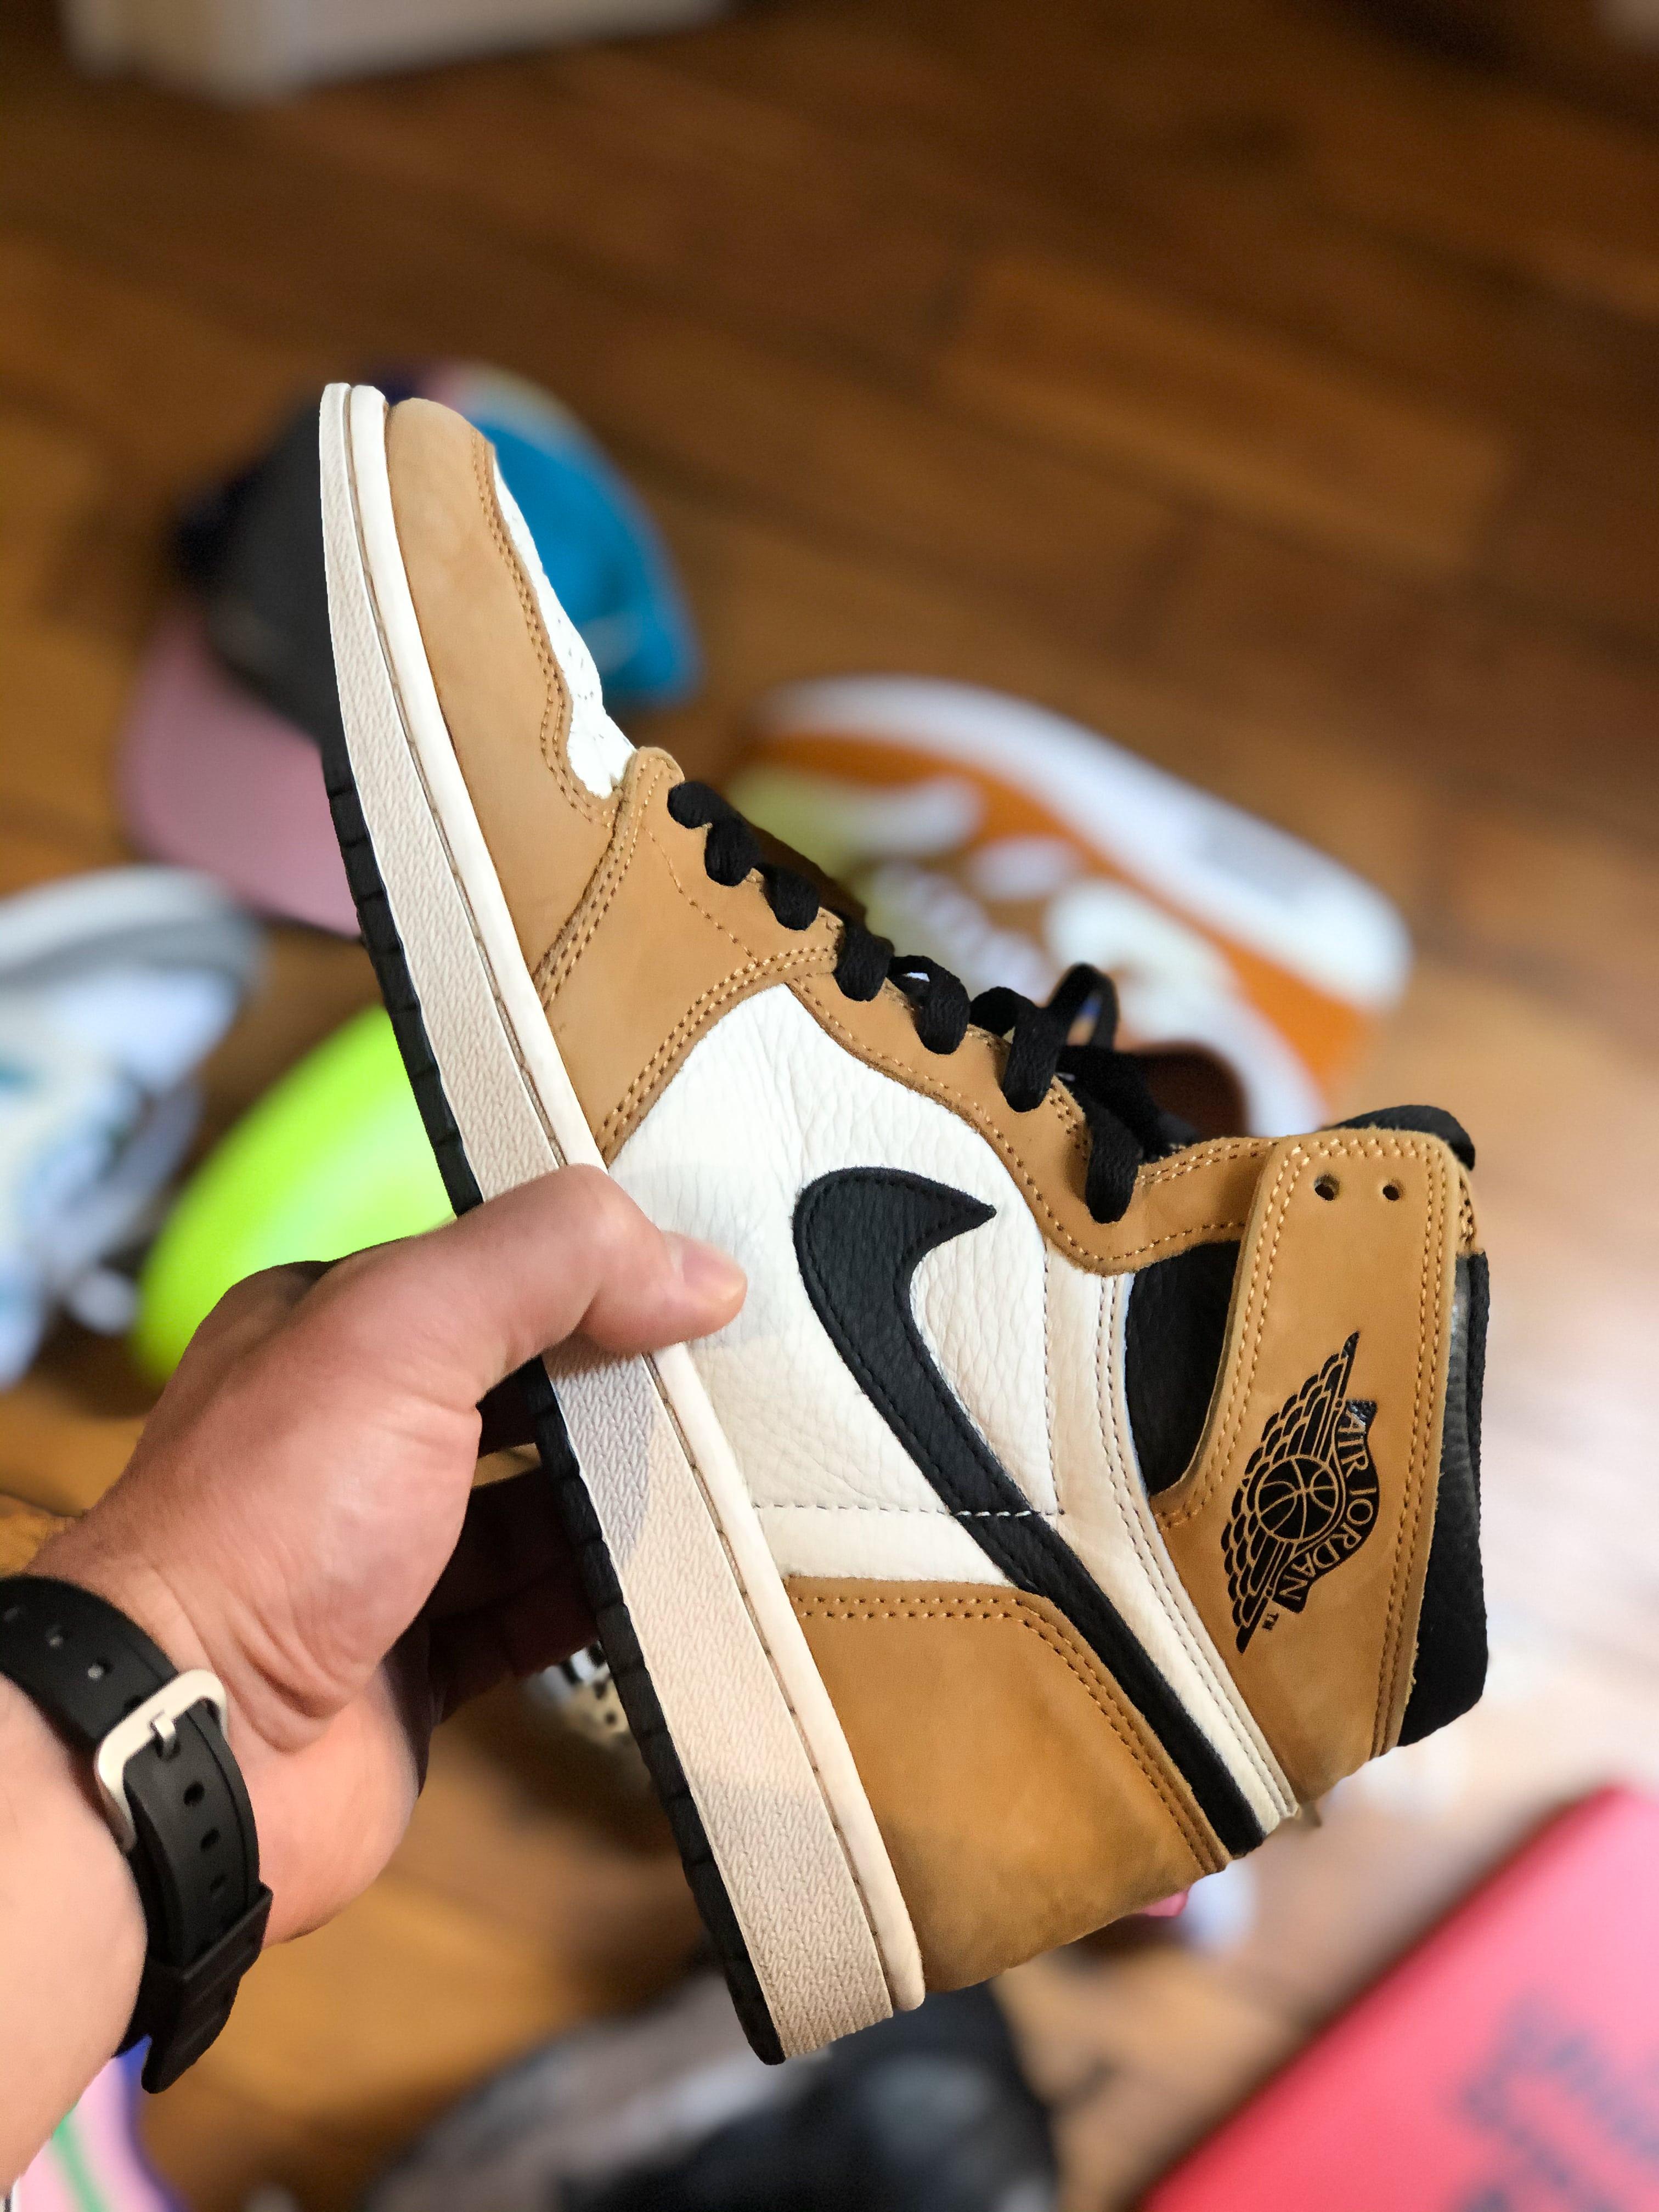 Nike Air Jordan 1 High 'Rookie Of the Year' - 2018